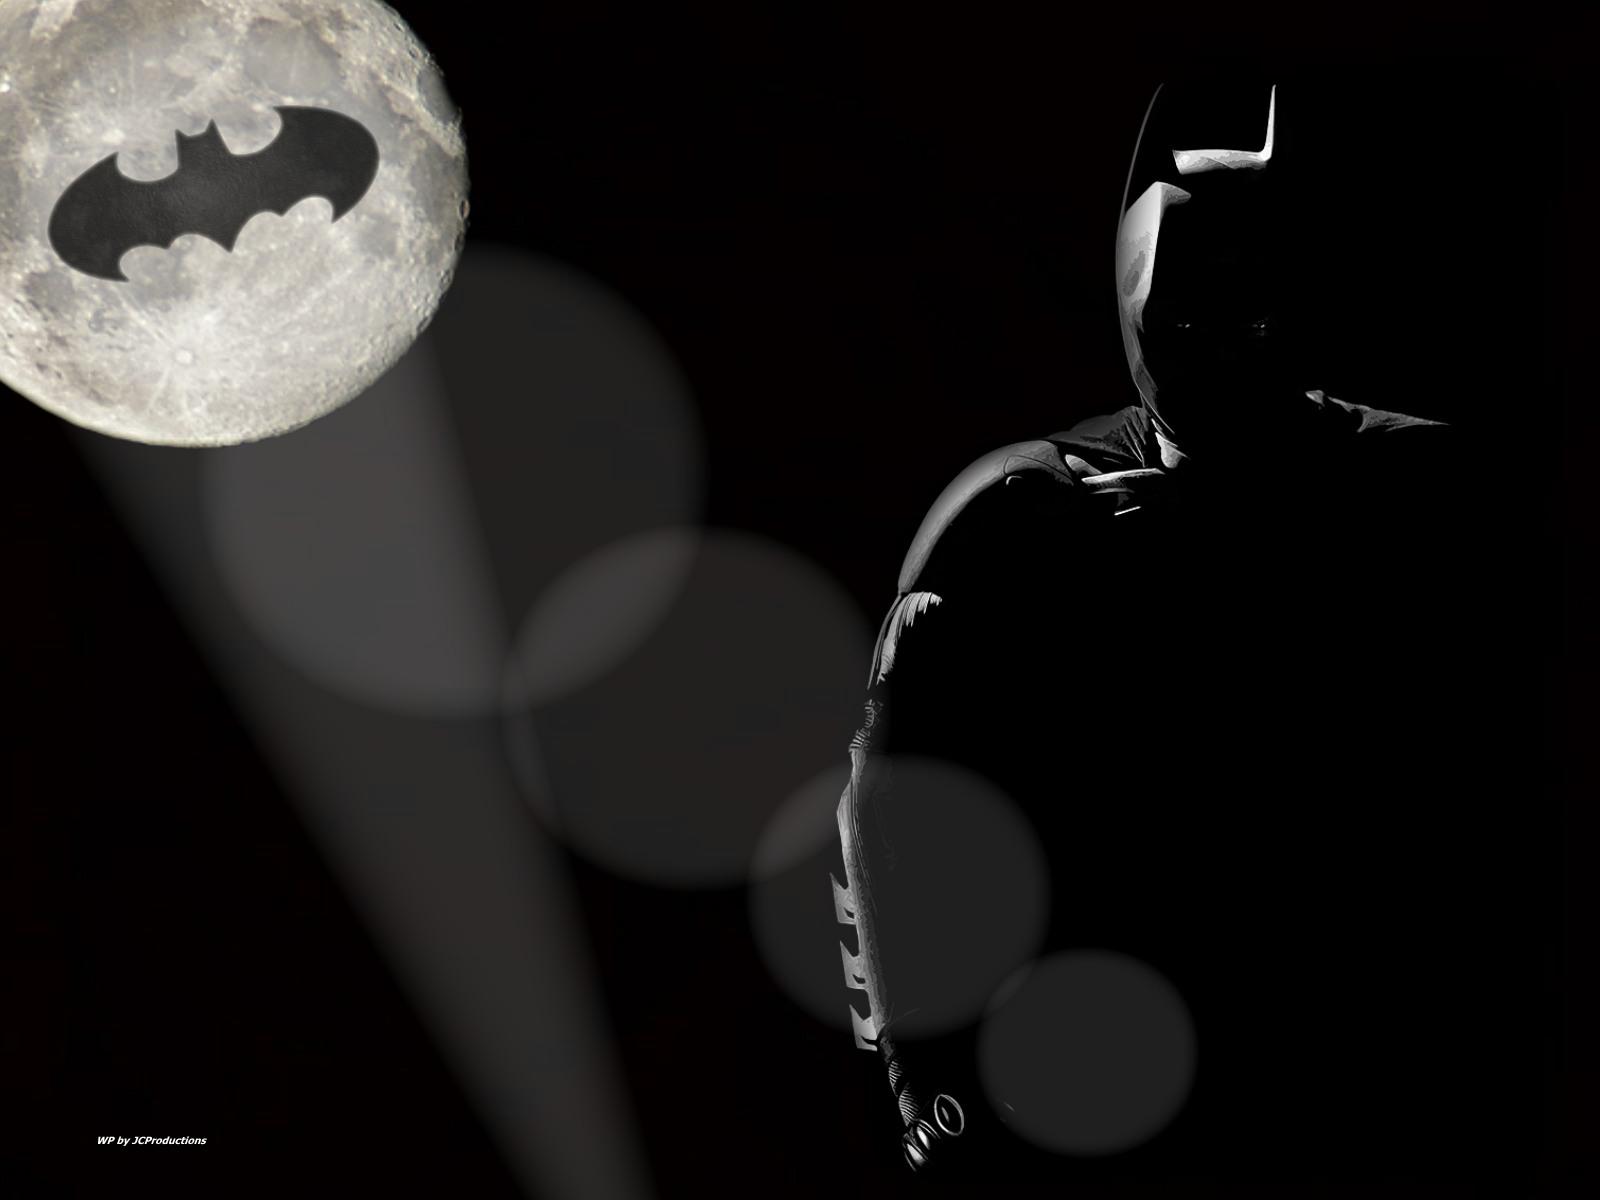 dc comics images batman hd wallpaper and background photos 27009082